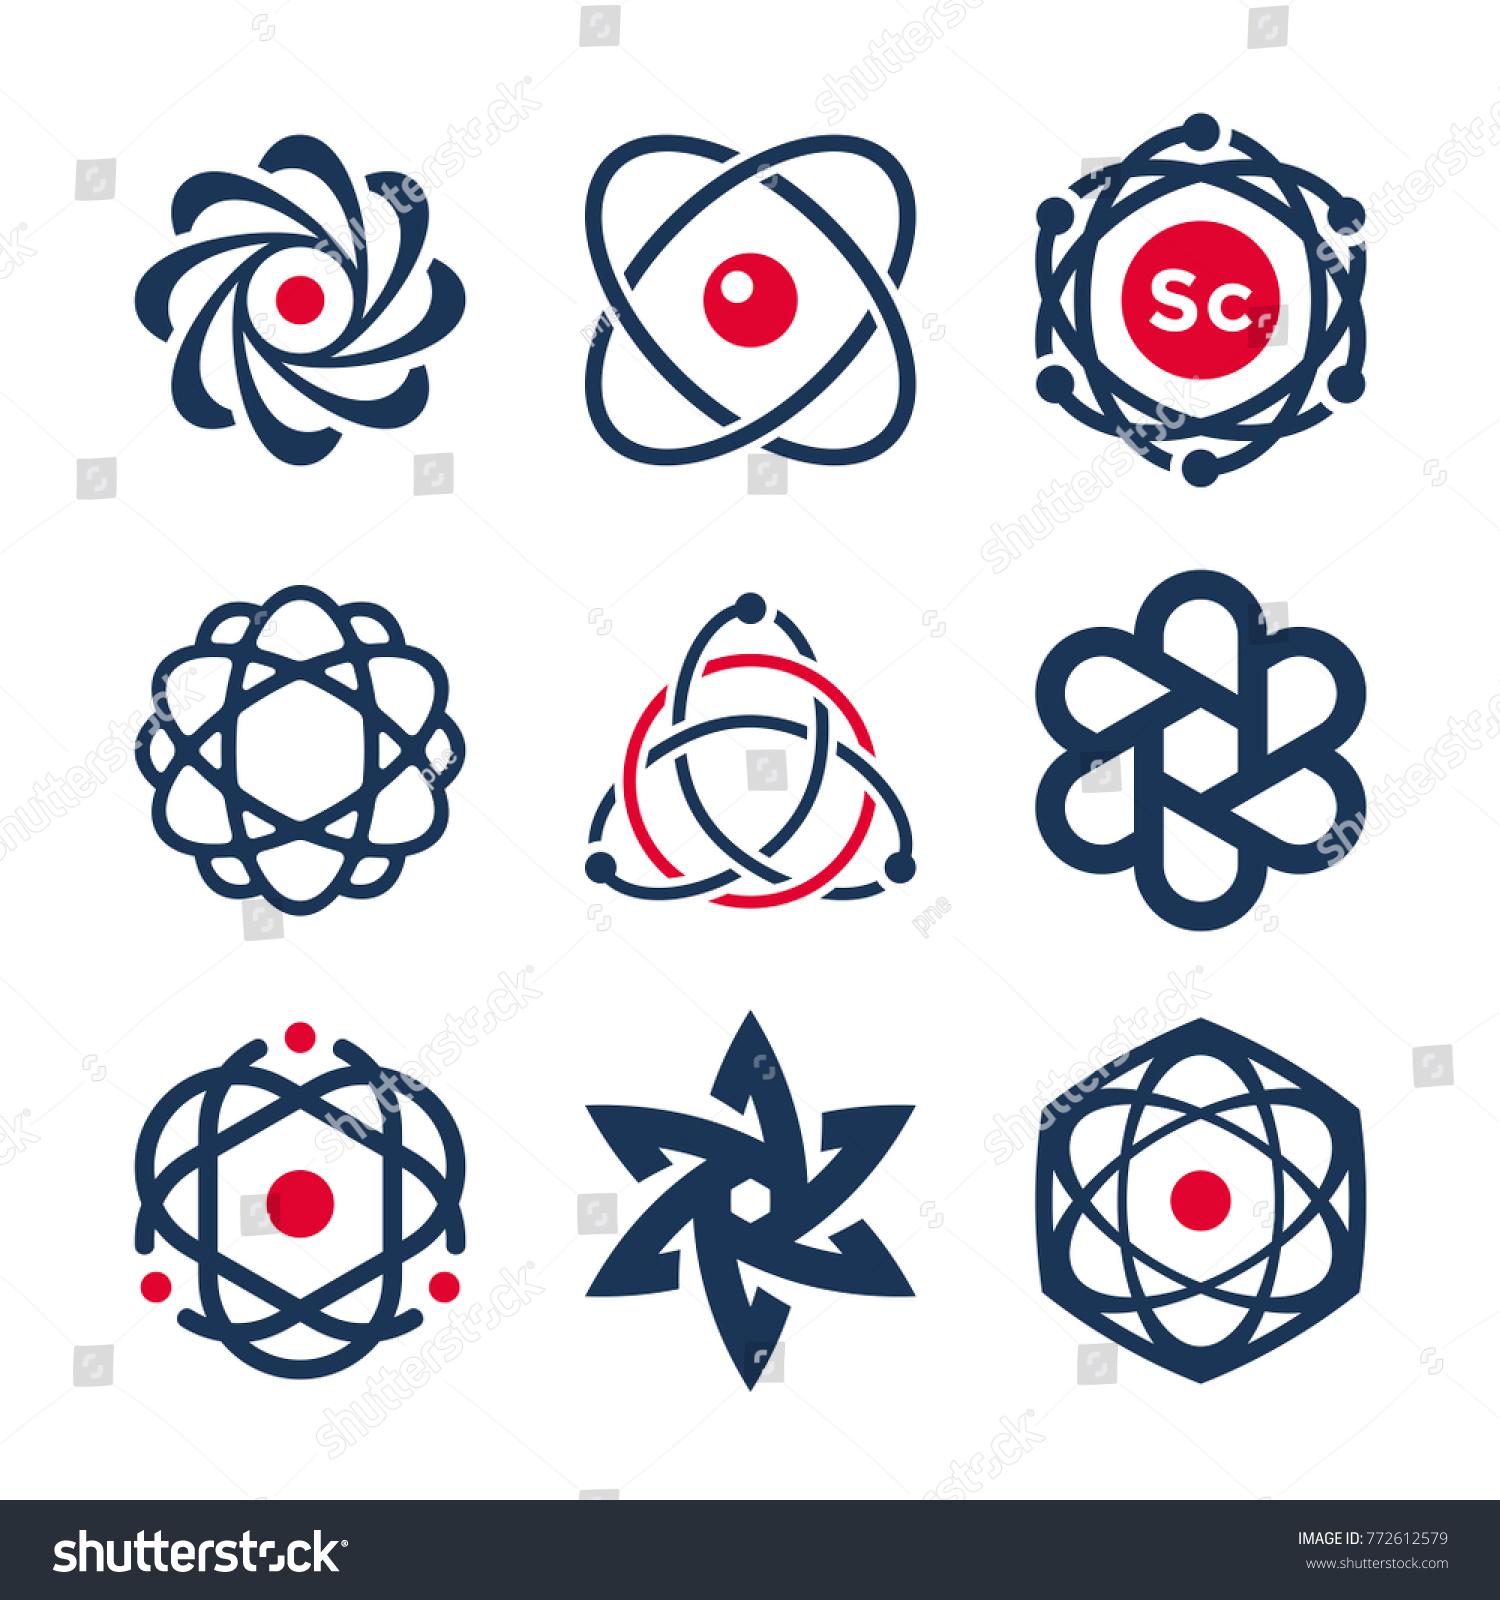 Symbols chemistry map maker mac science symbols atom molecule icons chemistry stock vector stock vector science symbols atom and molecule icons buycottarizona